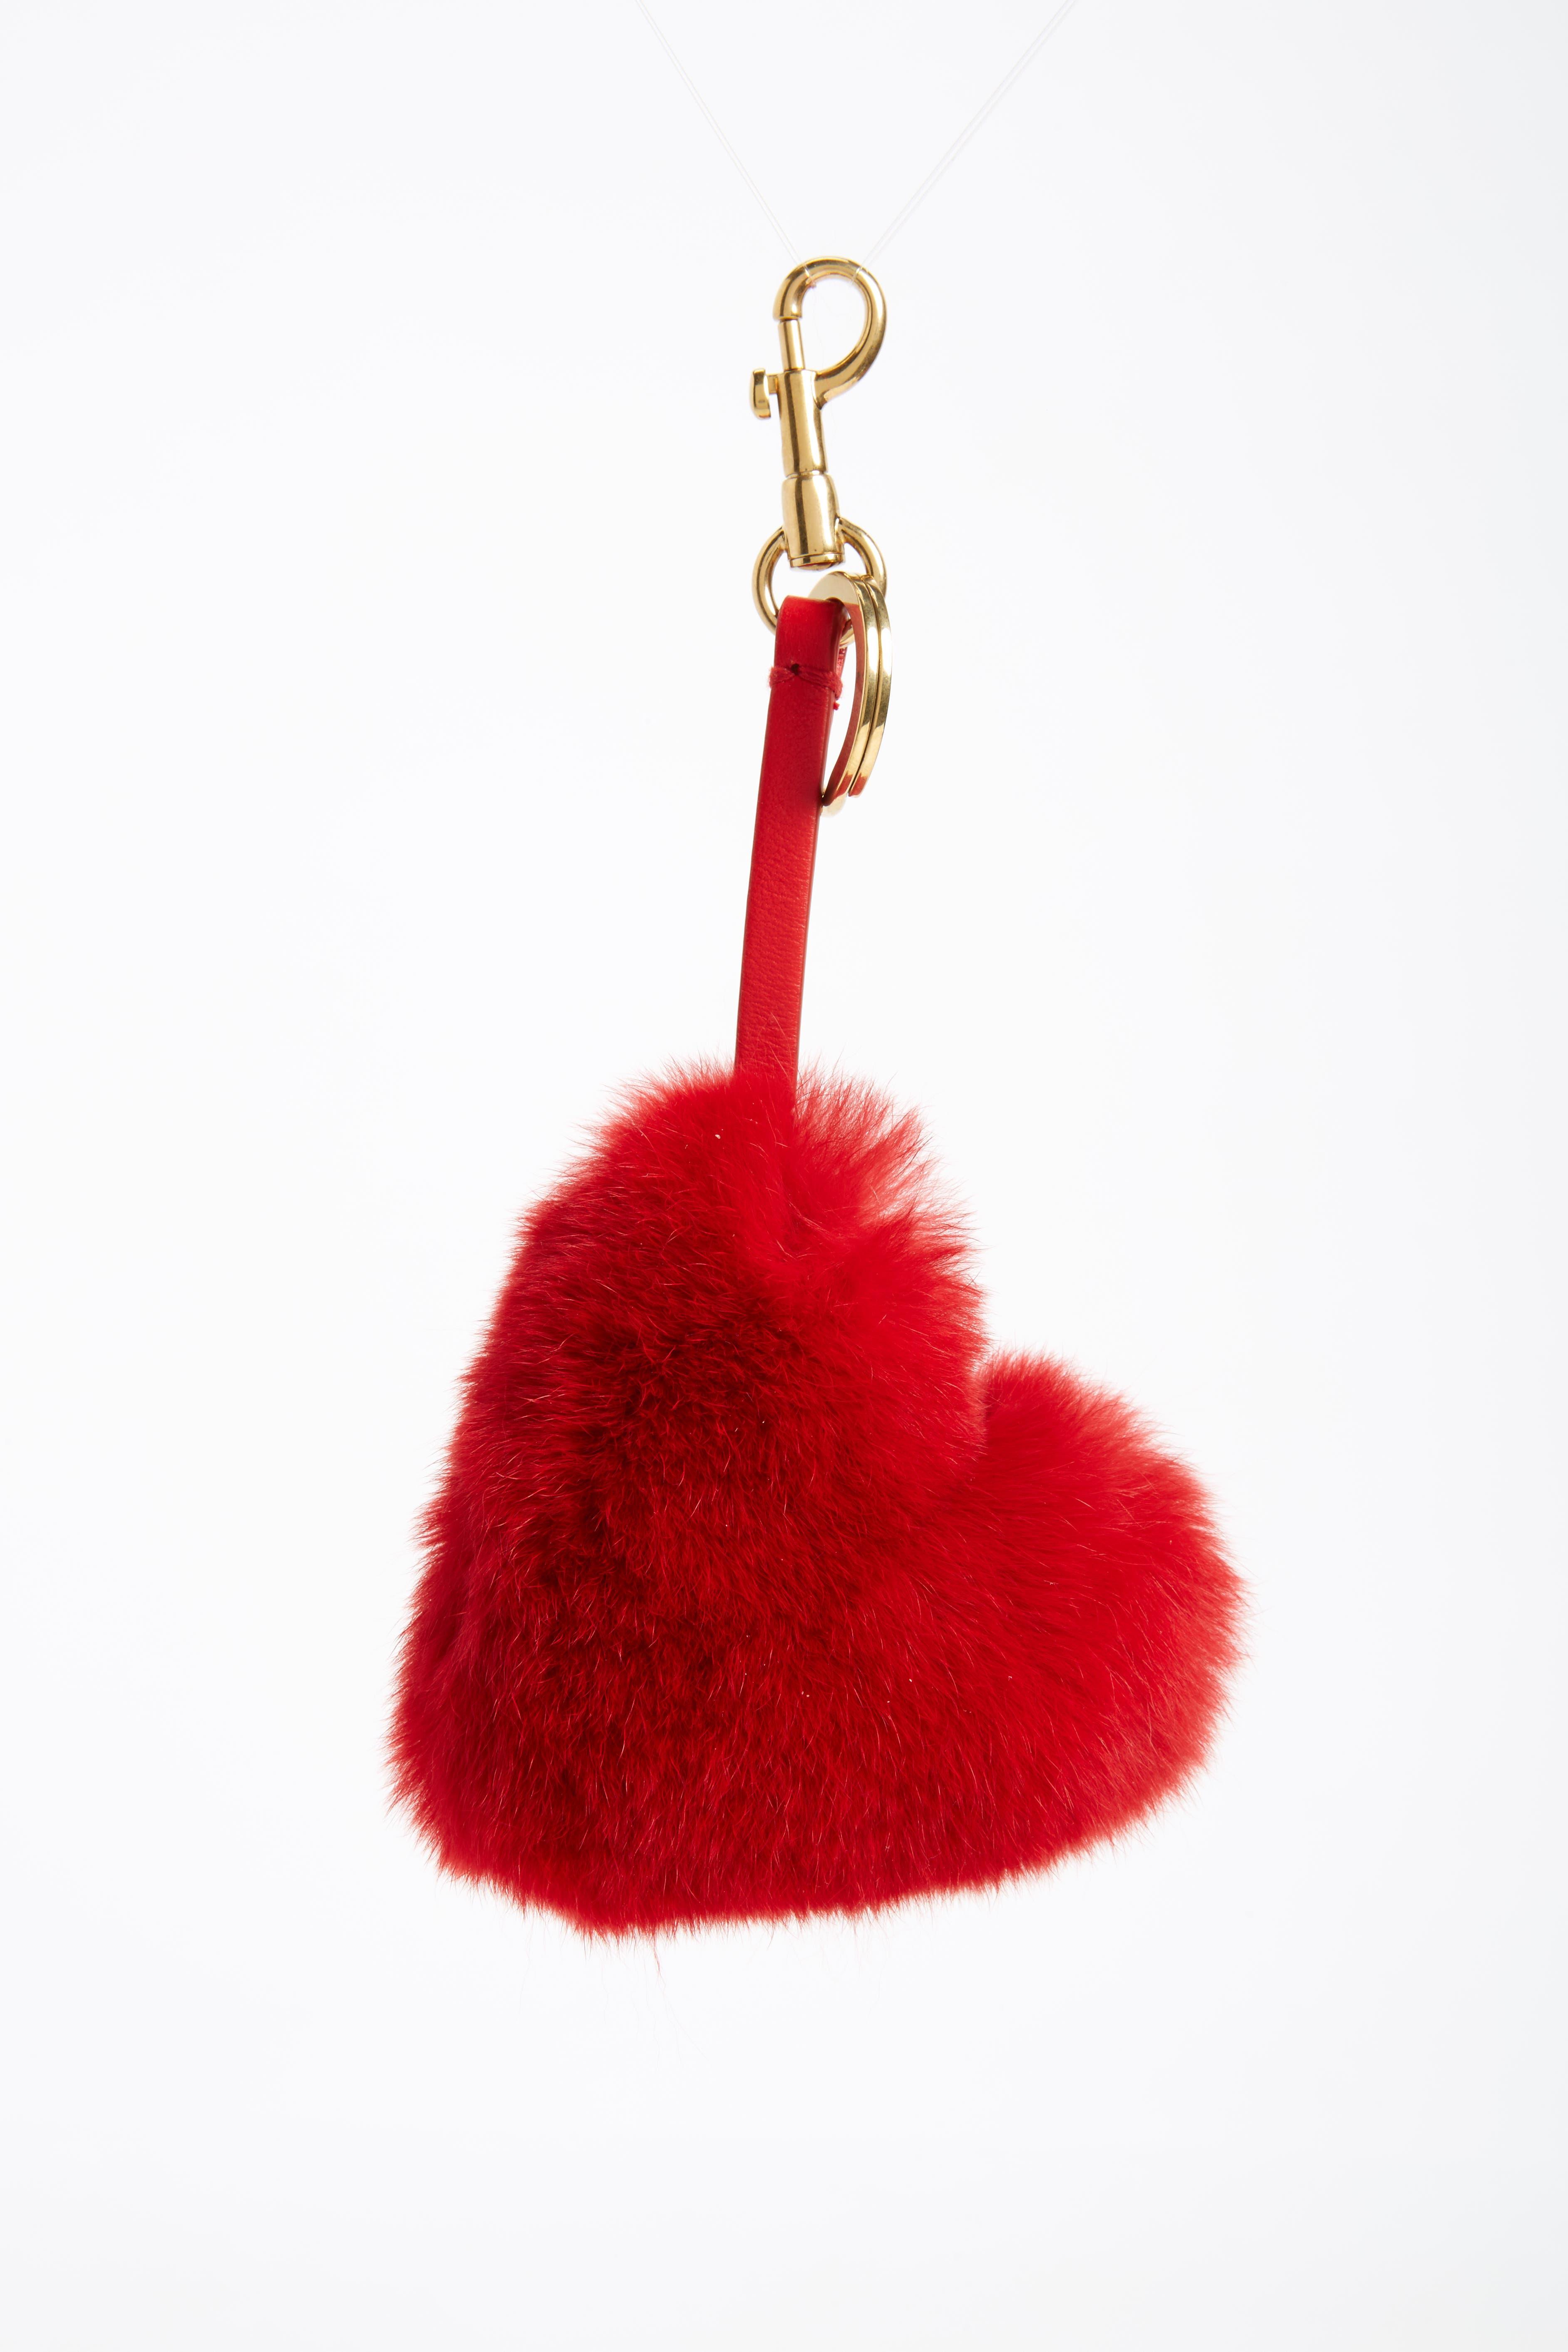 Alternate Image 1 Selected - Anya Hindmarch Heart Genuine Rabbit Fur Bag Charm